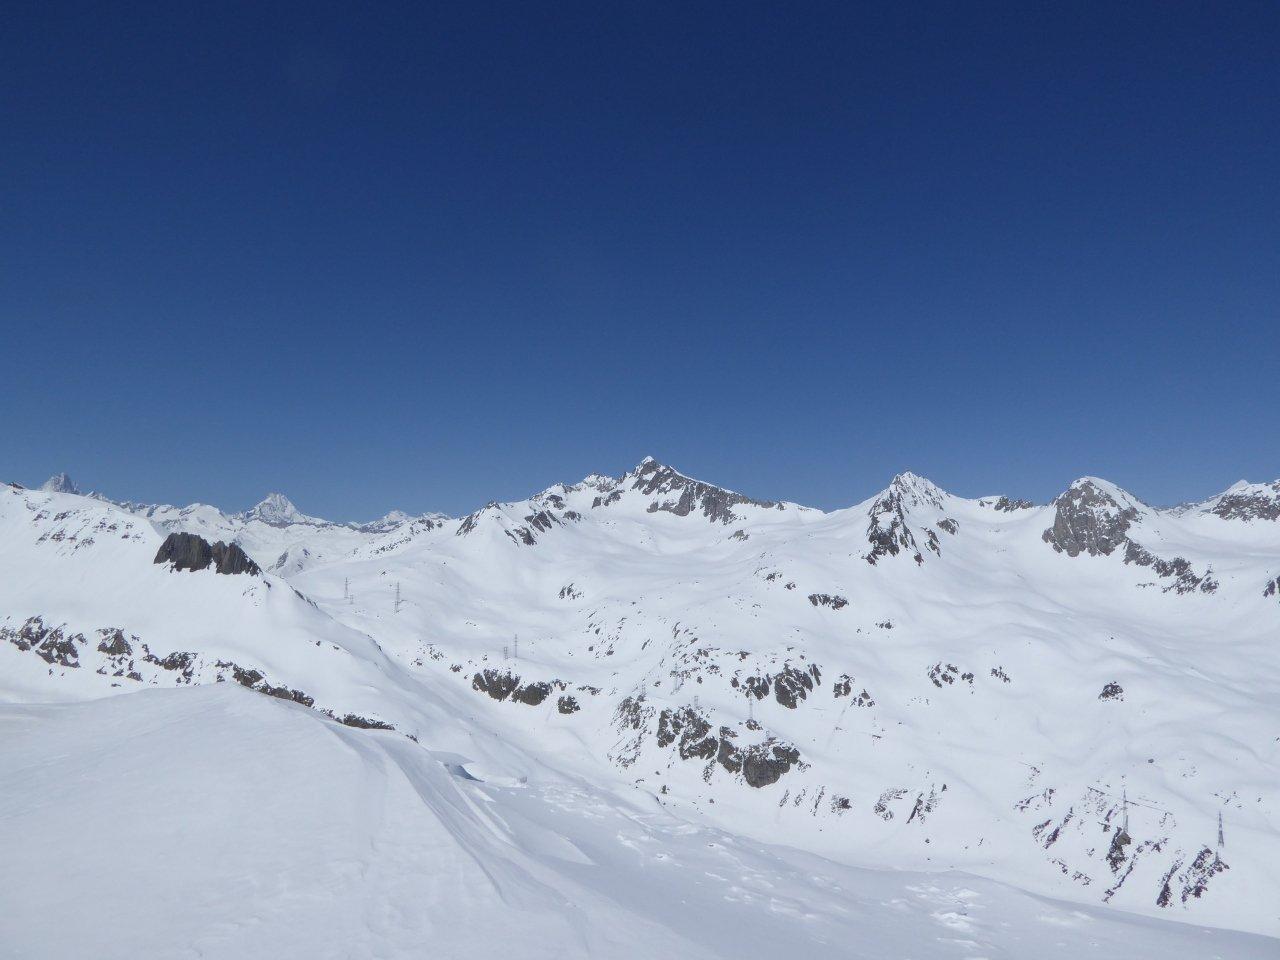 non male anche su questa cima secondaria (Helgerhon secondario) a nord dell'Helgerhorn principale...